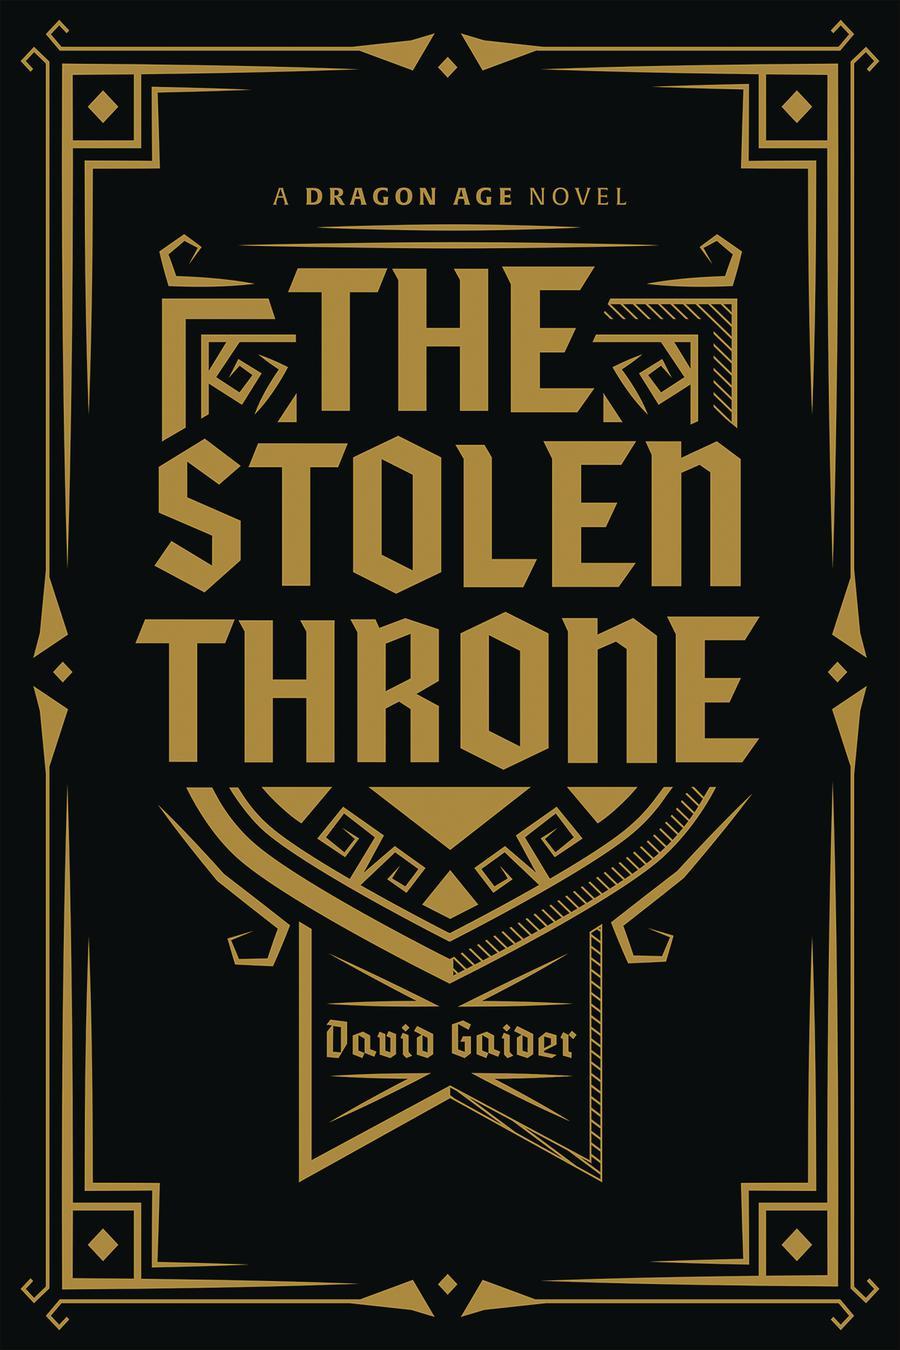 Dragon Age Stolen Throne Deluxe Edition HC